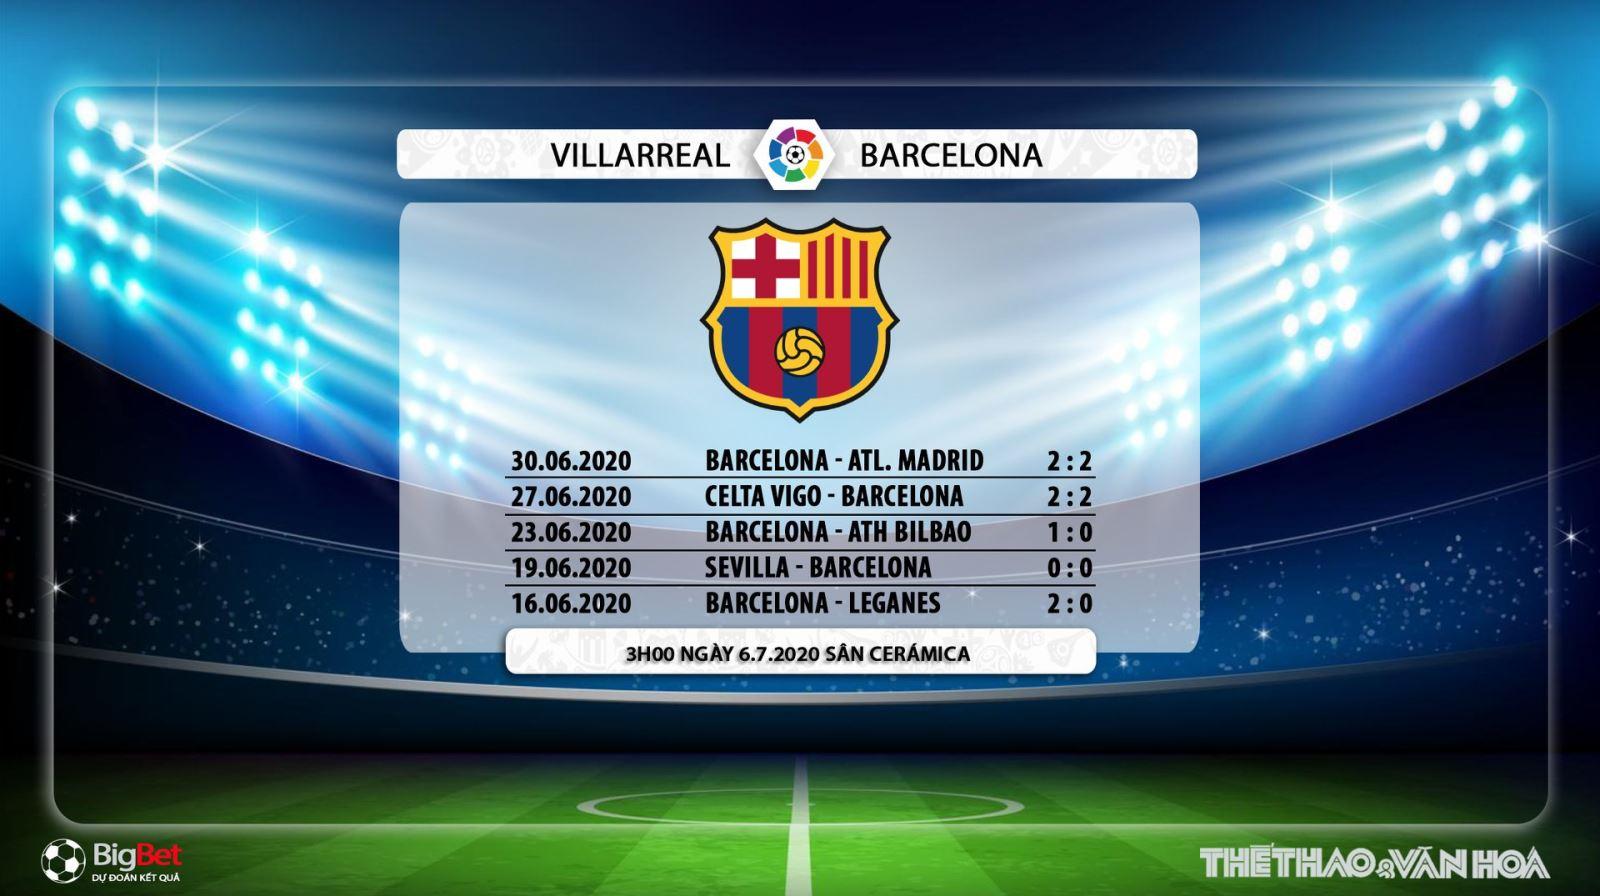 Villarreal vs Barcelona, Villarreal, Barcelona, Barca, bóng đá, bong da, soi kèo, kèo bóng đá